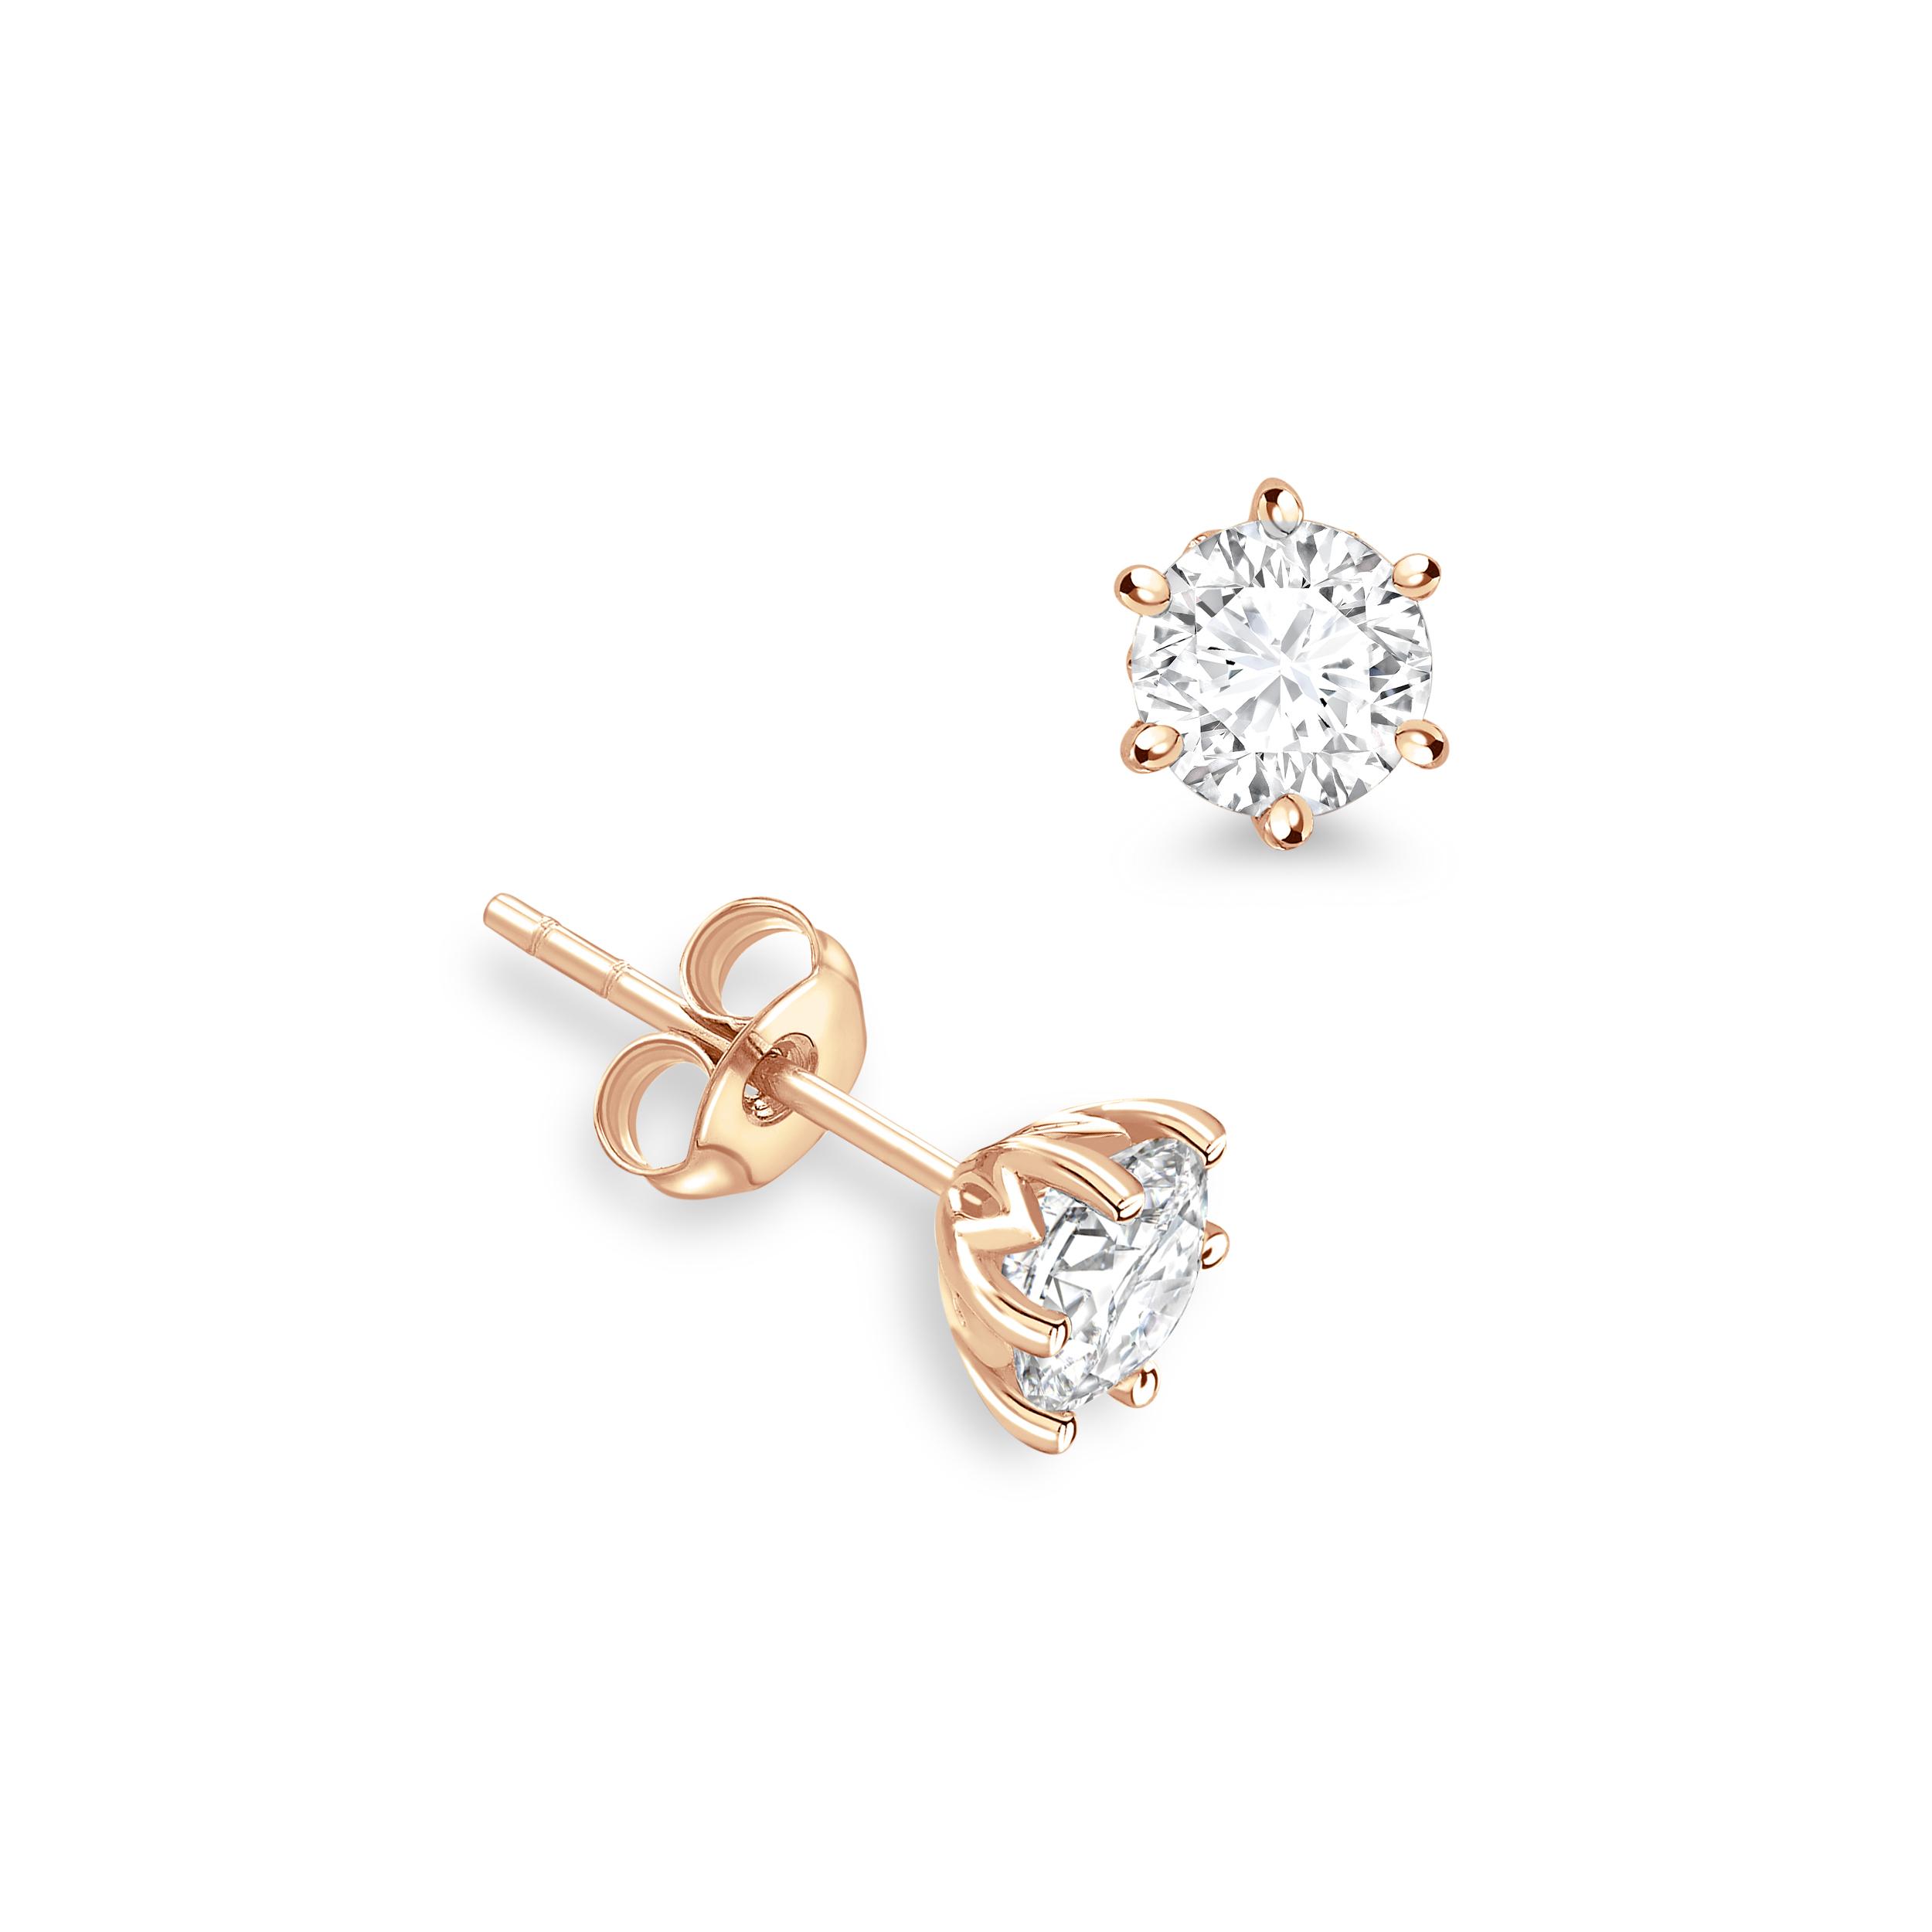 6 Claws Round Shape Crown Stud Diamond Earrings Abelini